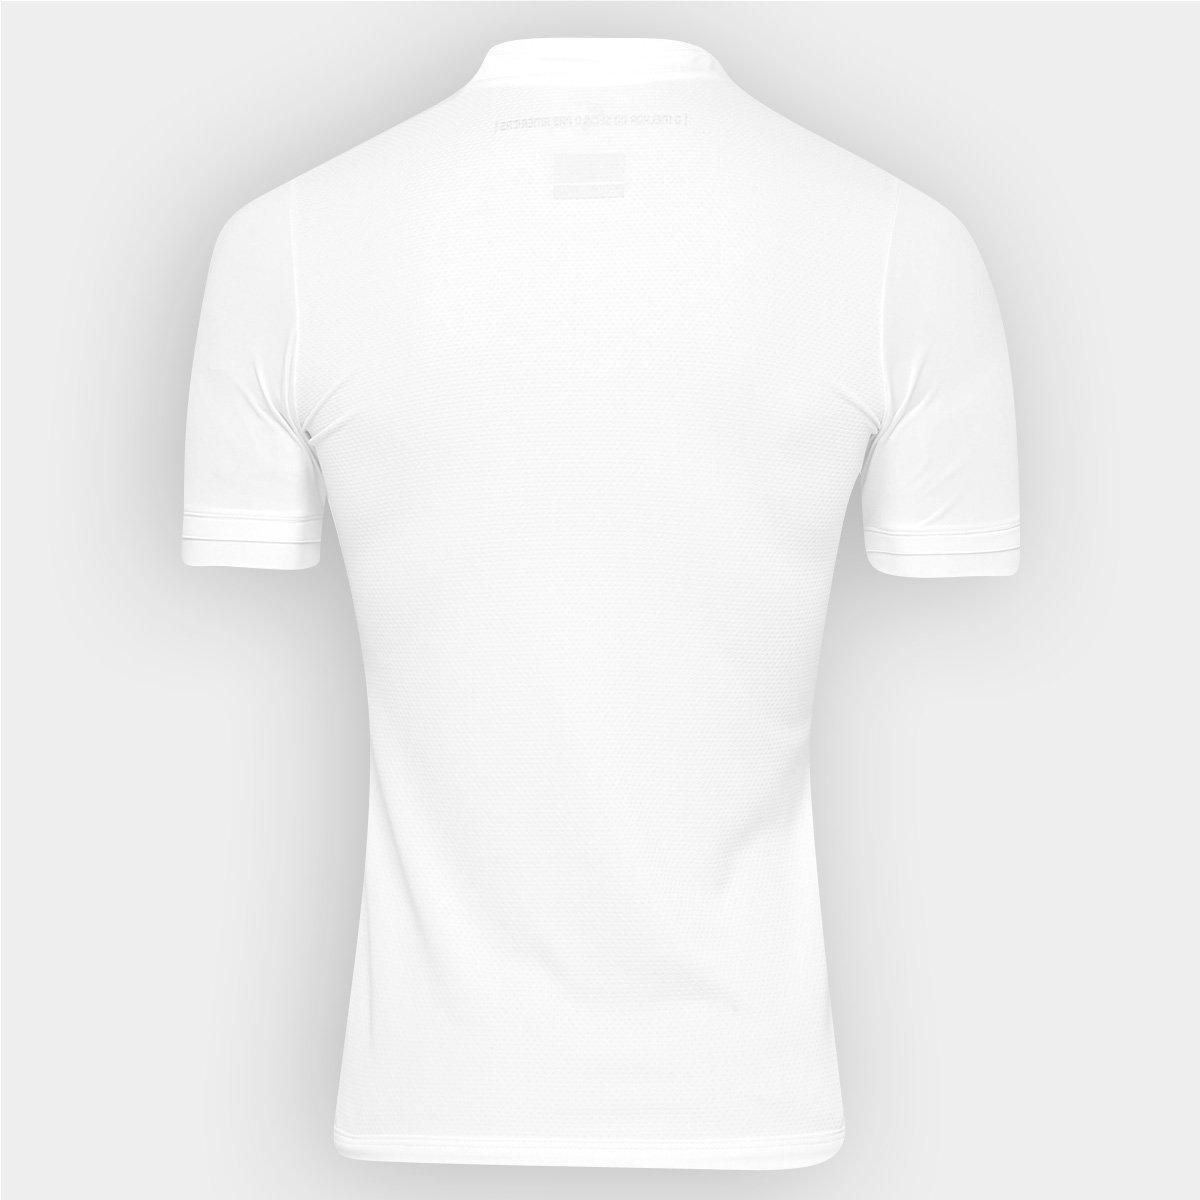 e0fbd0e1f9 Camisa Santos I 2016 s nº Kombat Torcedor Kappa Masculina - Compre ...